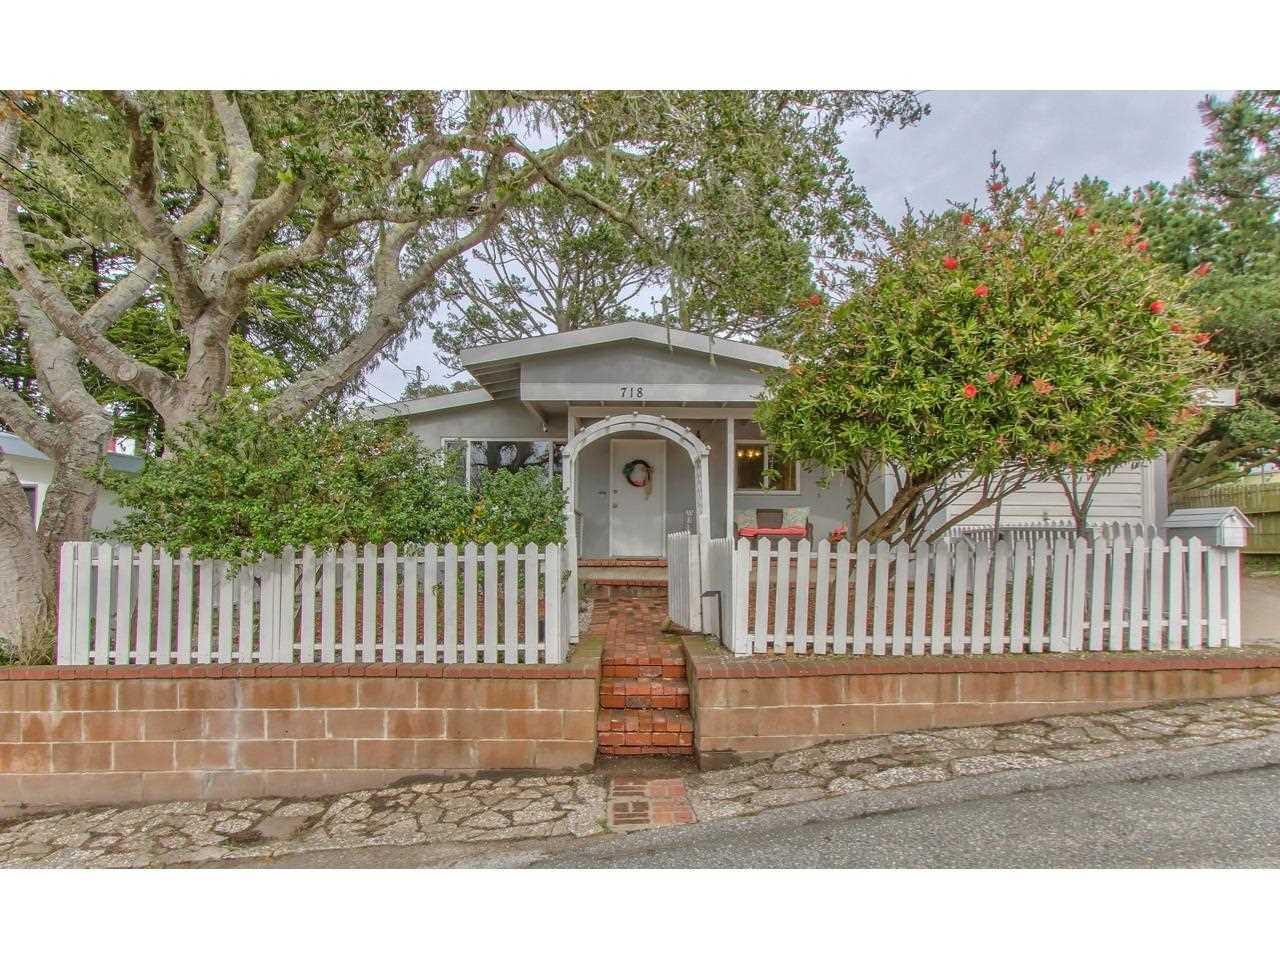 718 Devisadero St,MONTEREY,CA,homes for sale in MONTEREY Photo 1